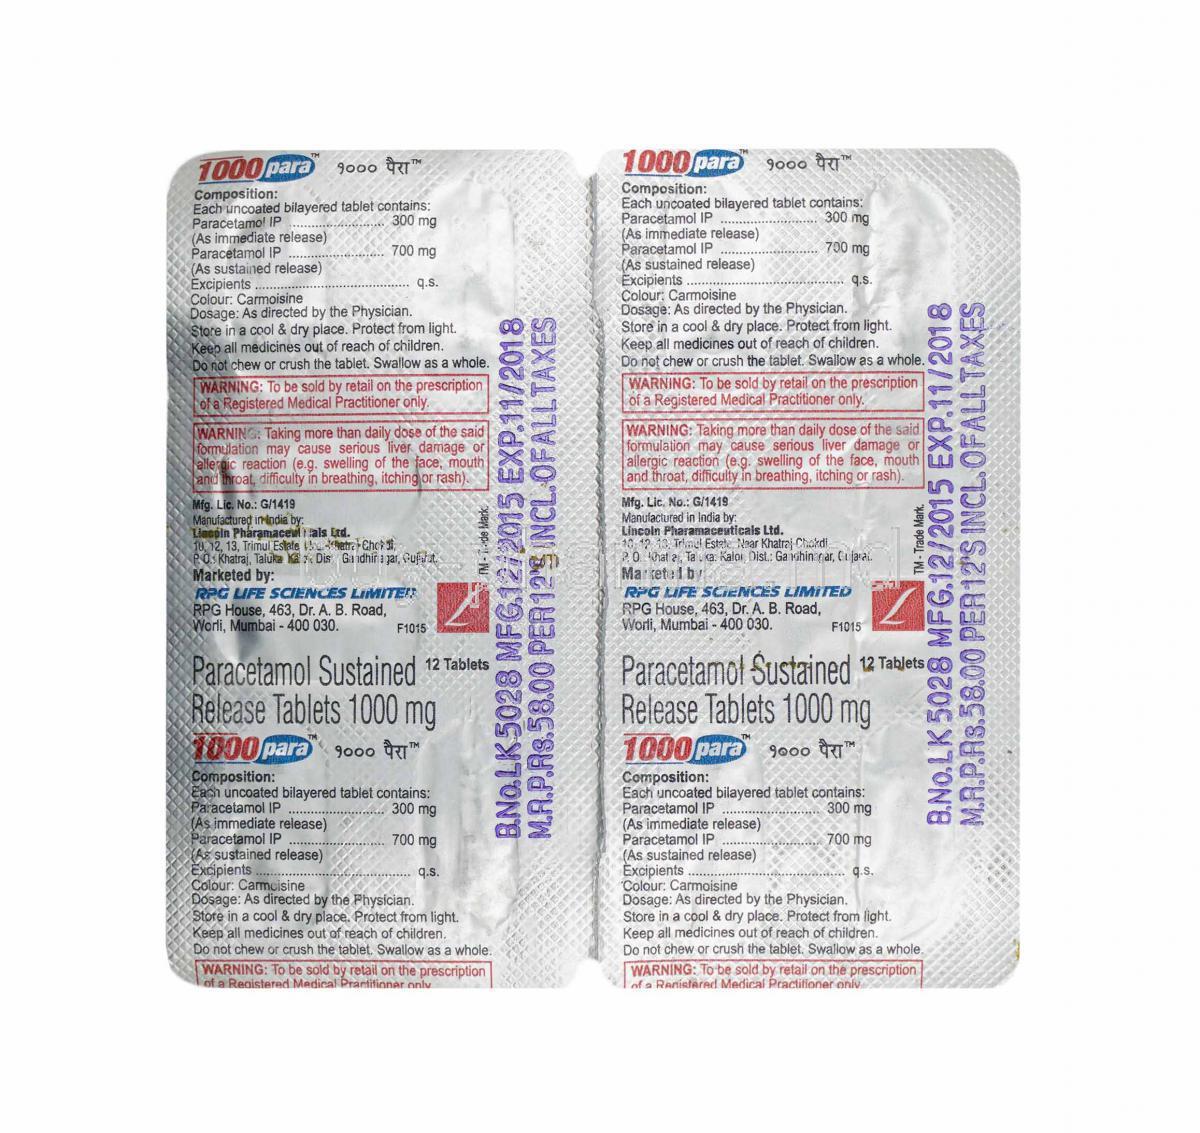 1000 para paracetamol buy 1000 para paracetamol rh buy pharma md para tablet whatsapp para tablet juegos